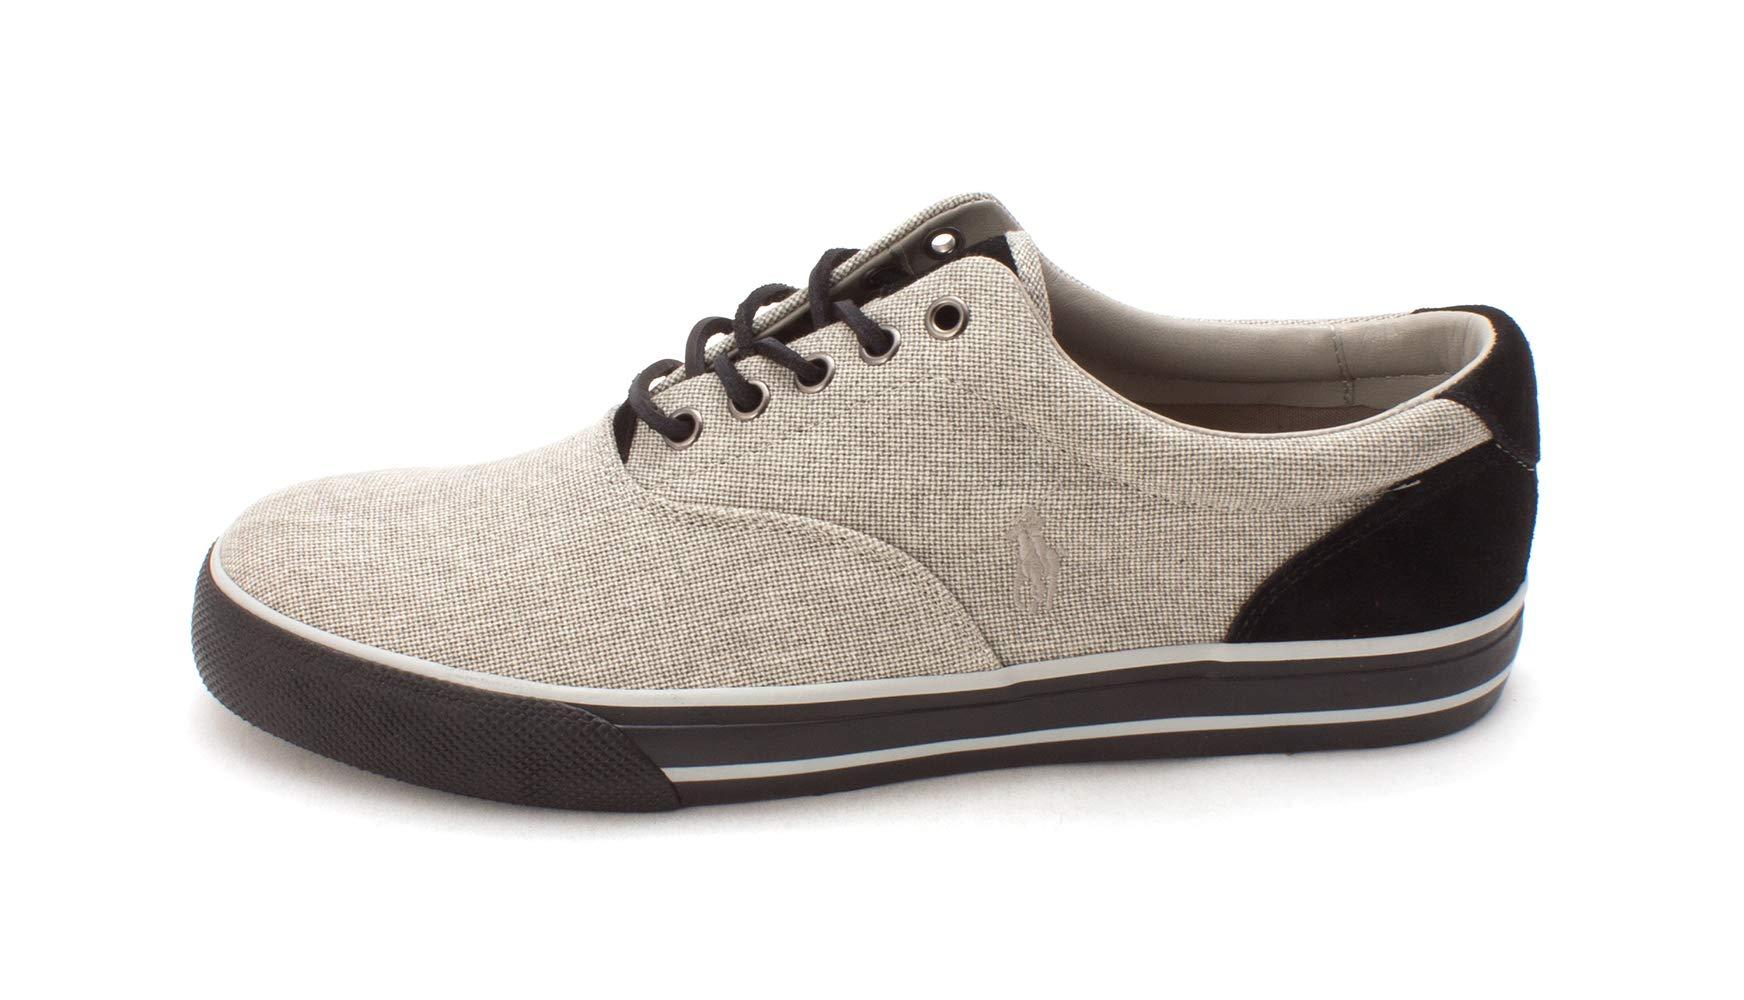 Polo Ralph Lauren Mens Vaughn Fabric Low Top Lace up, Grey/Black, Size 11.0